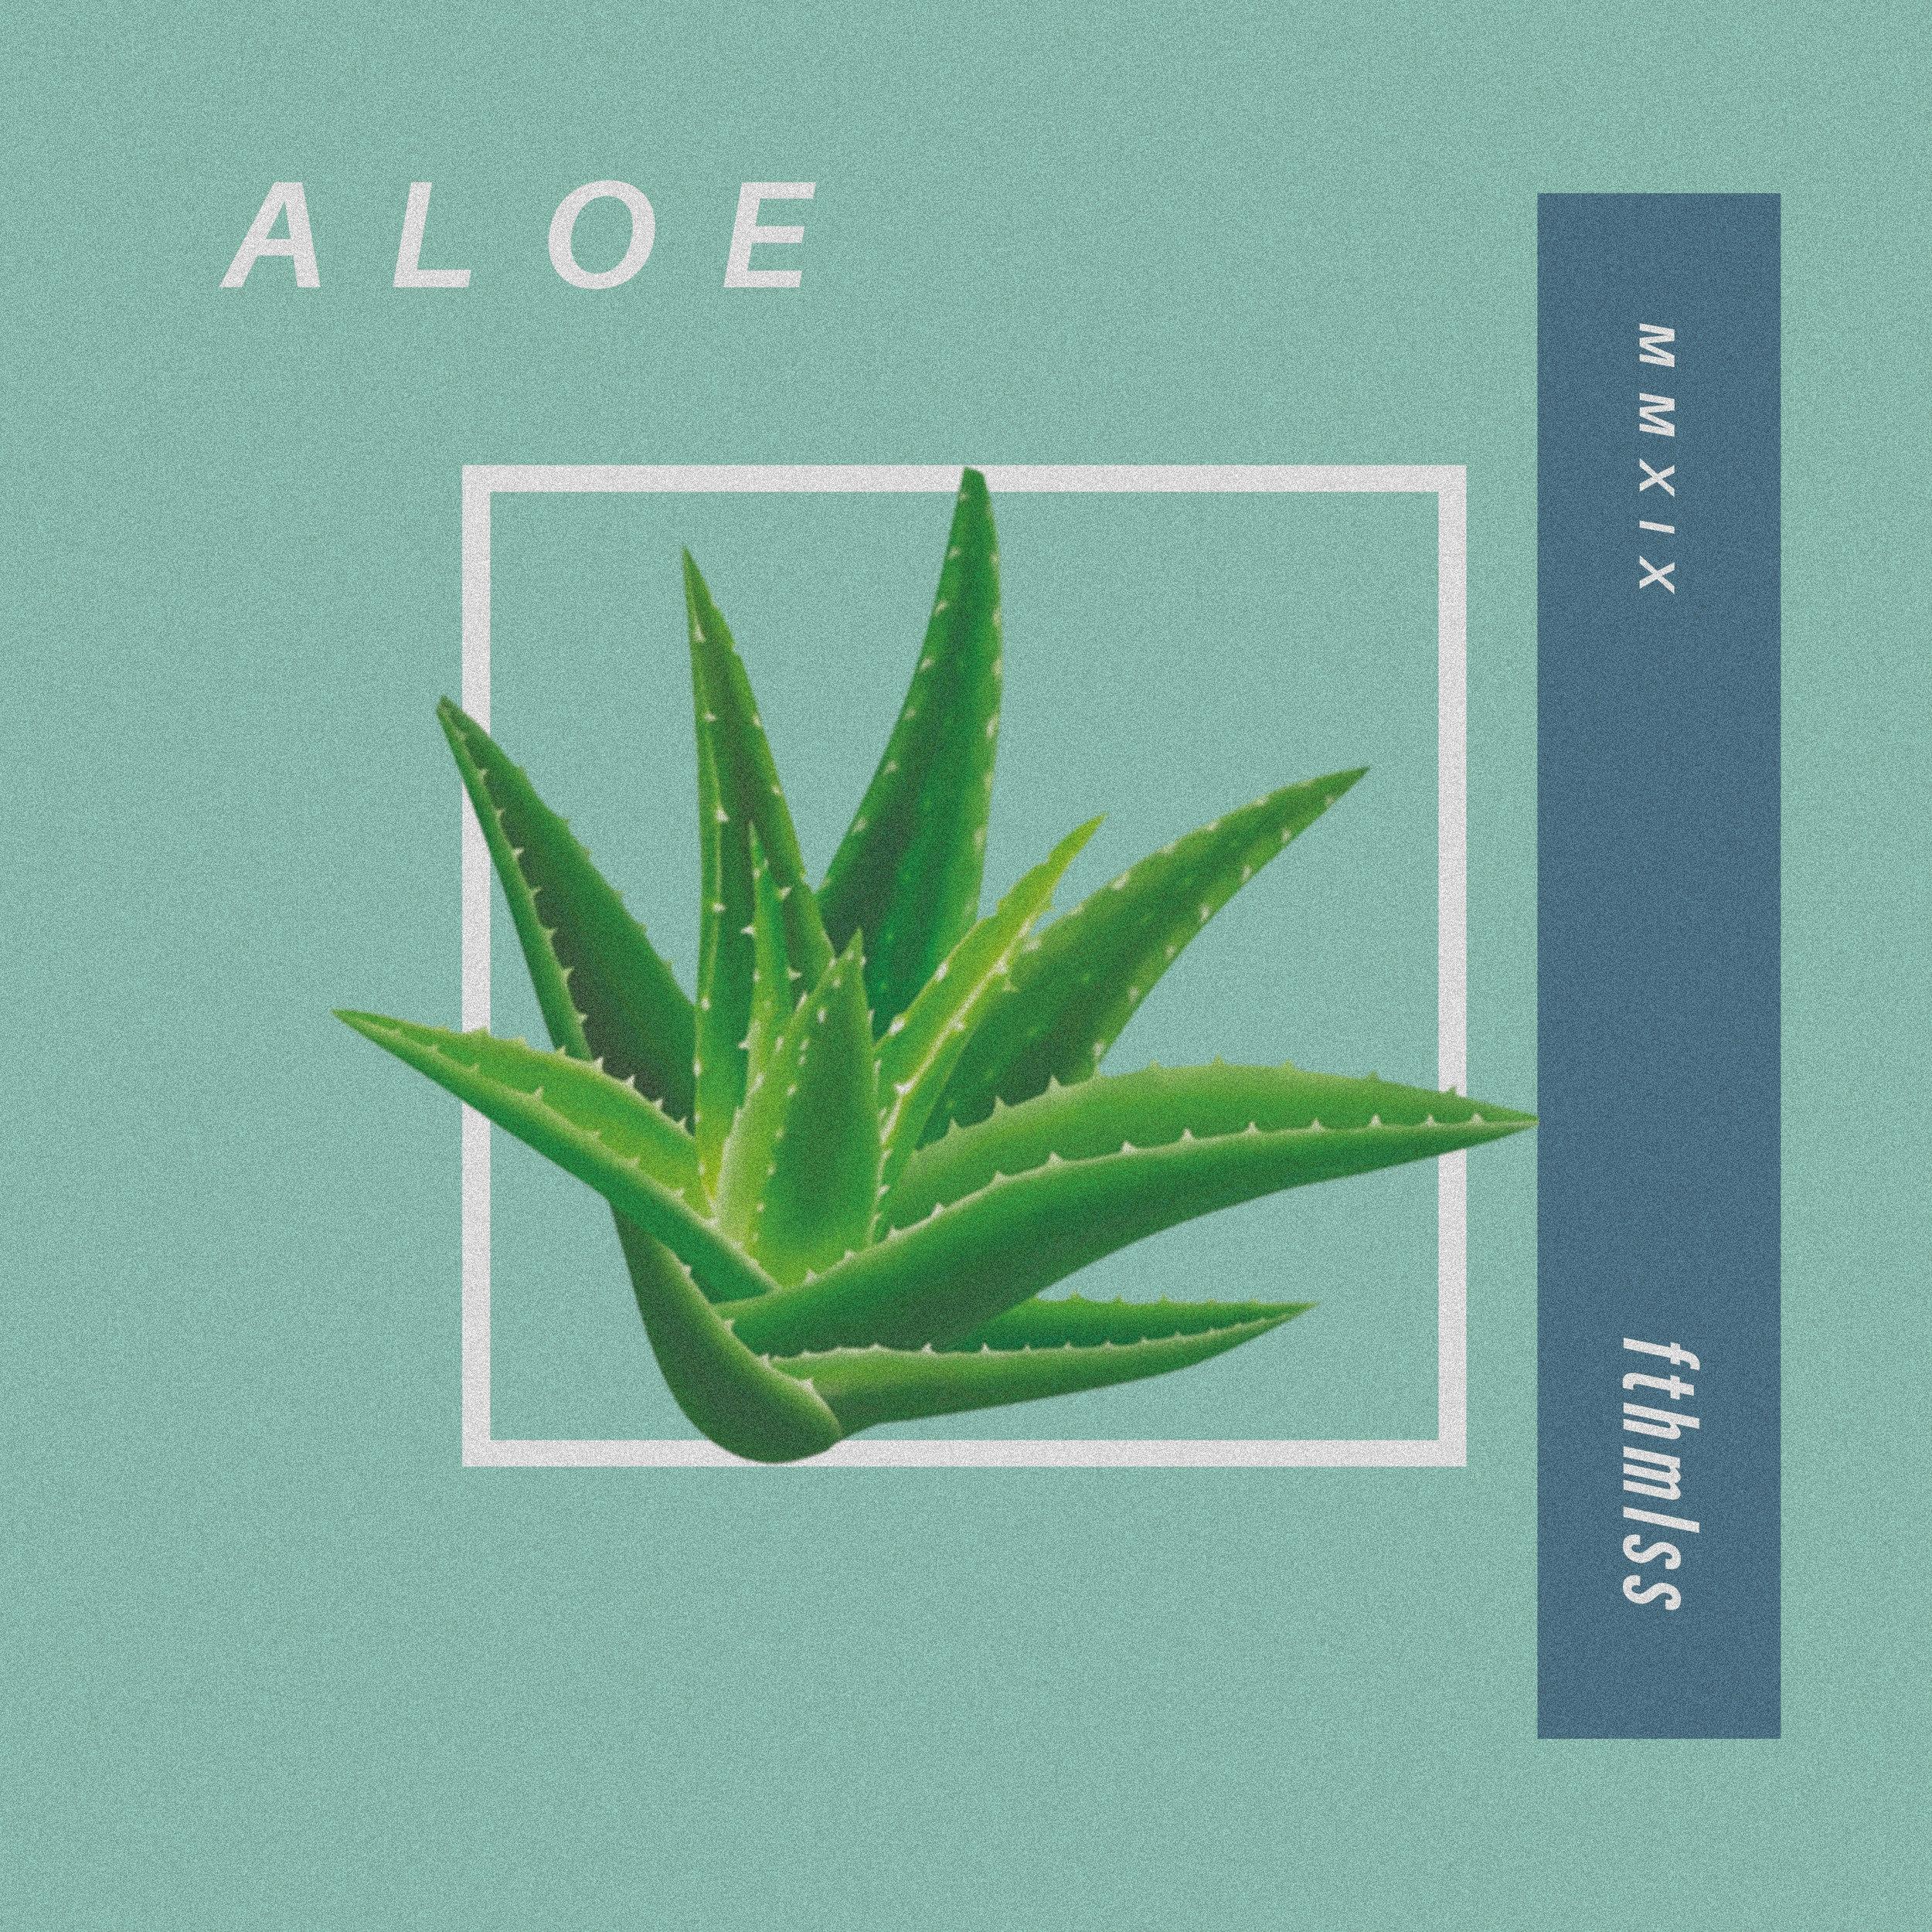 fthmlss - Aloe (digital album - grain).jpg